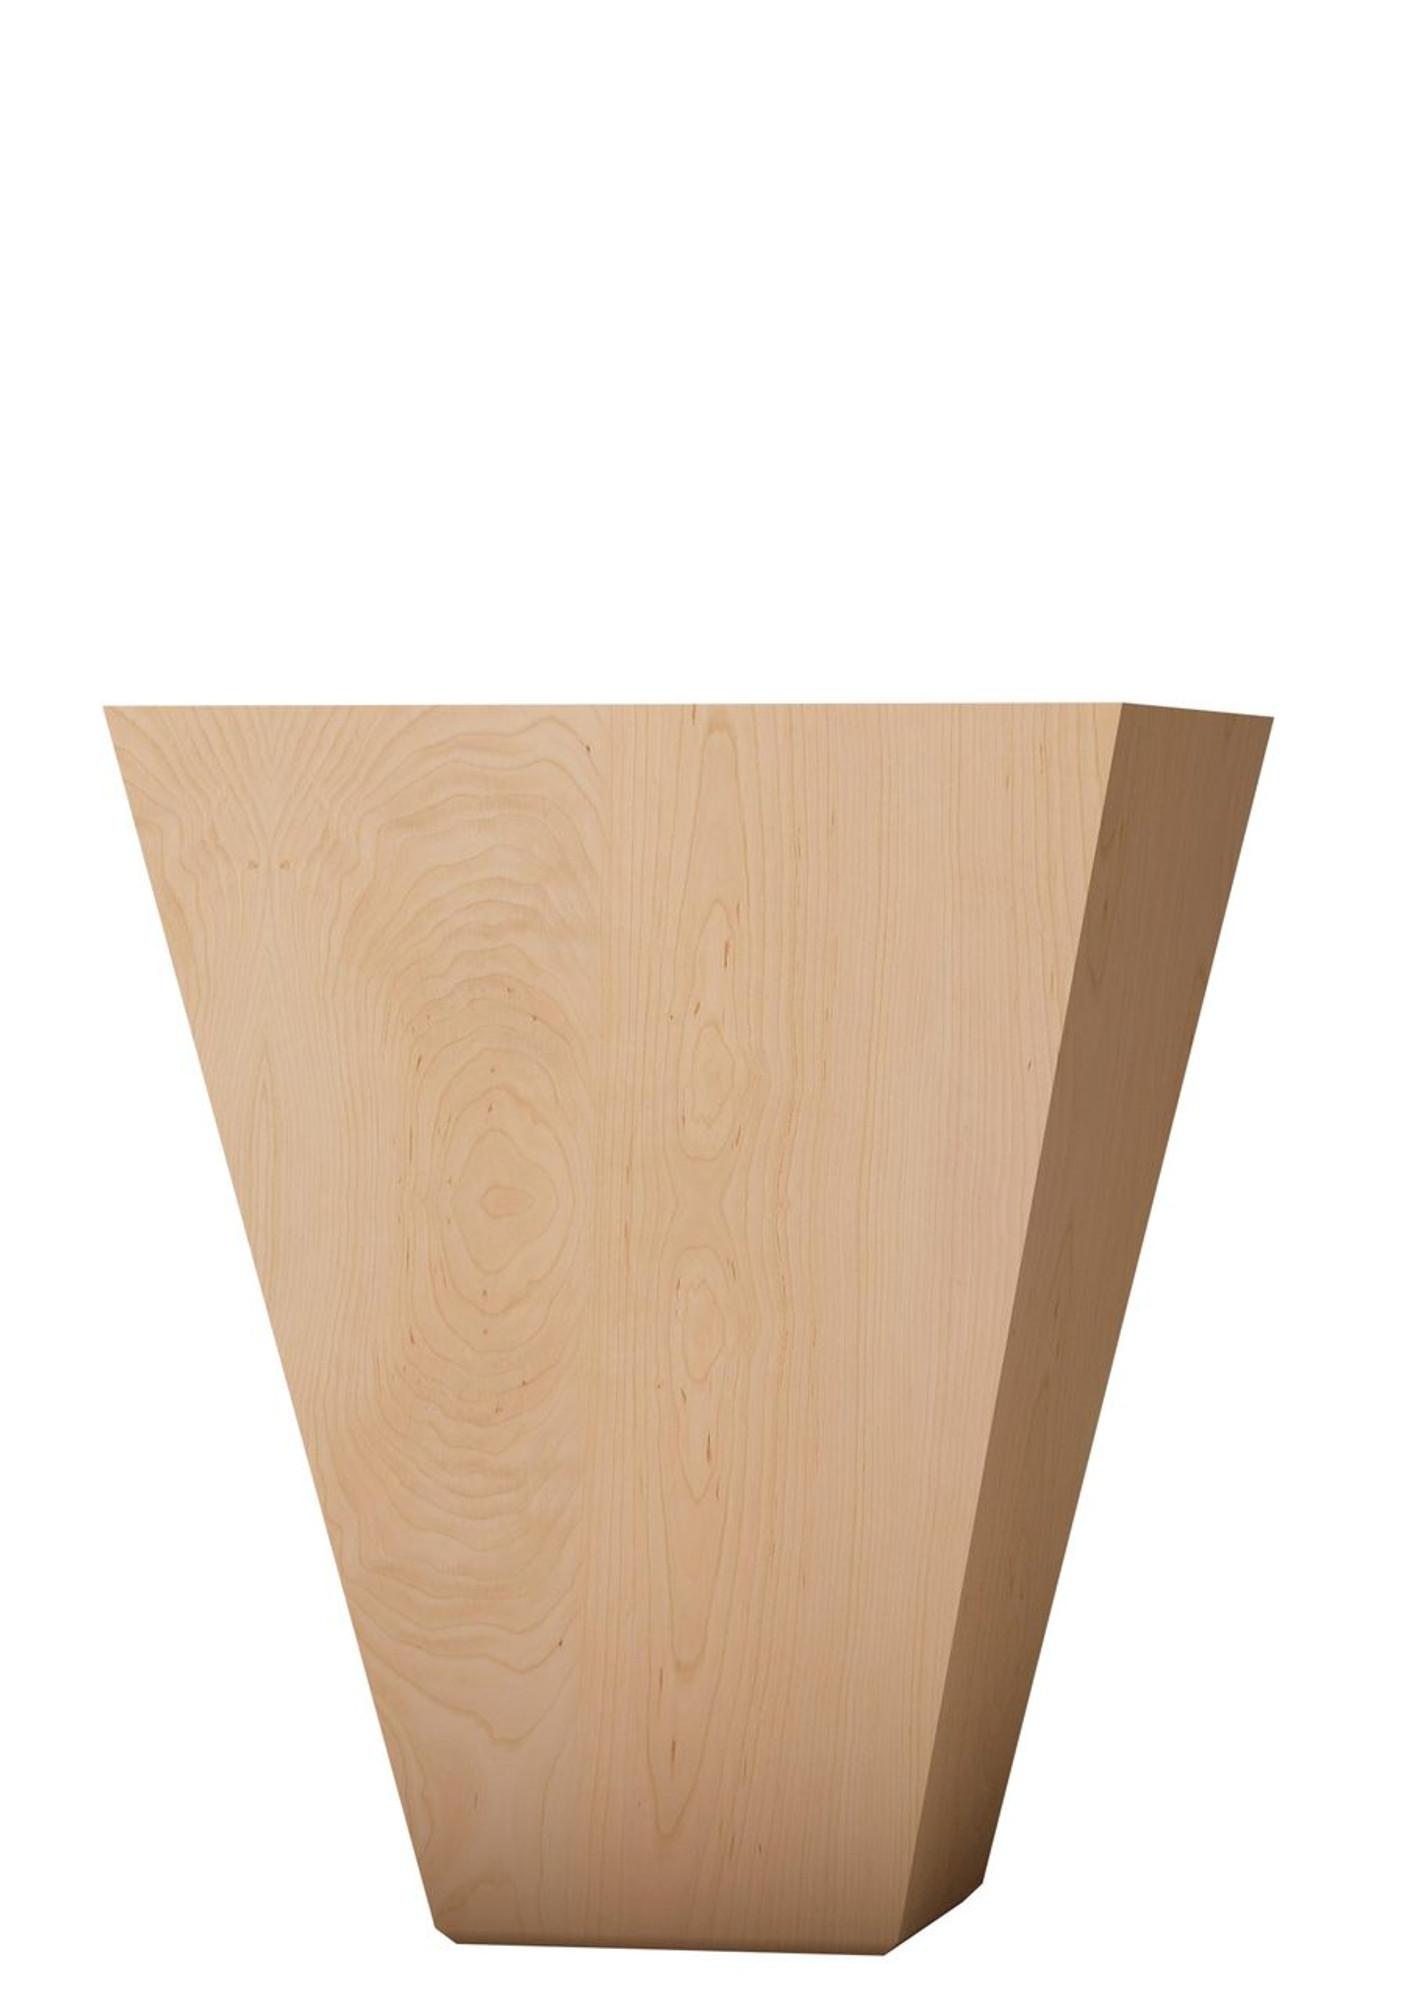 Medium Dallas Furniture Foot 4. Shop for Wooden Furniture Feet  Bun Feet    Sofa Legs   TableLegs com